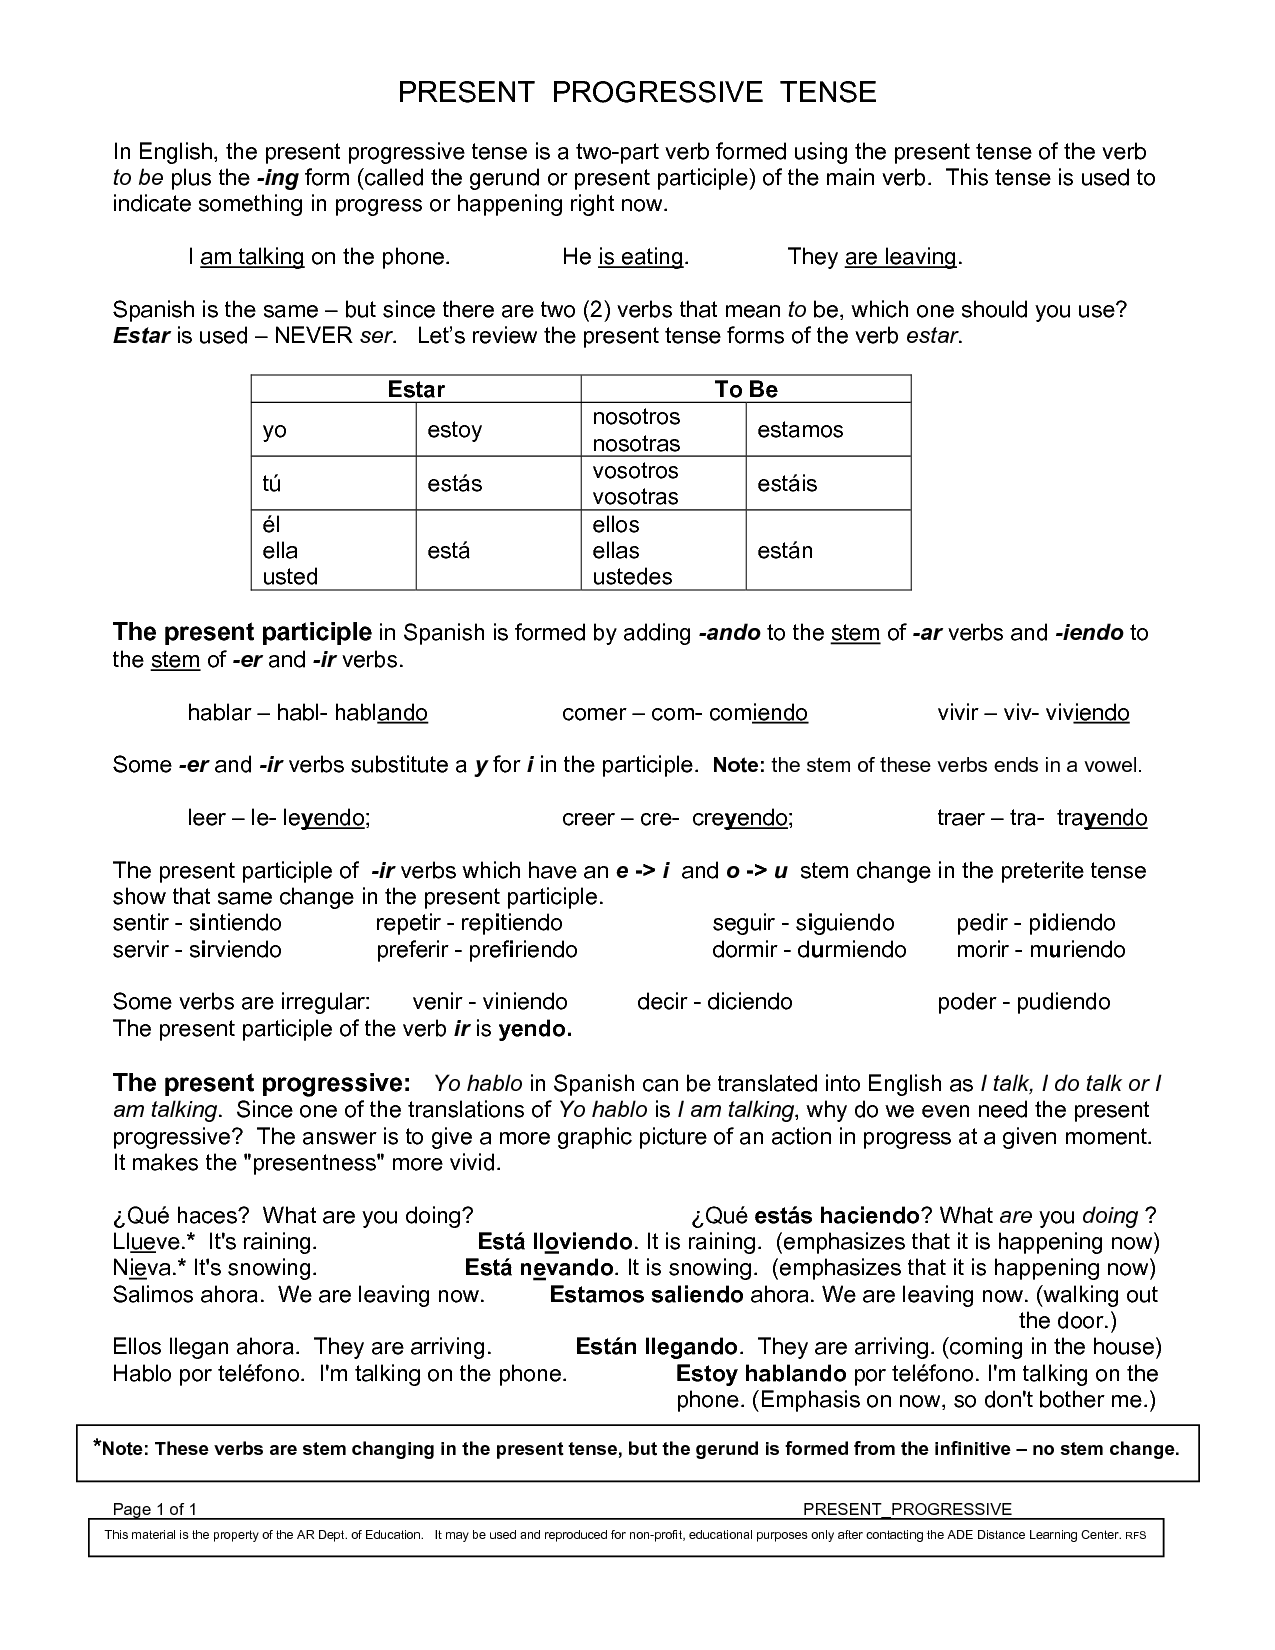 Present Progressive Regular And Irregular Verbs R2 3b